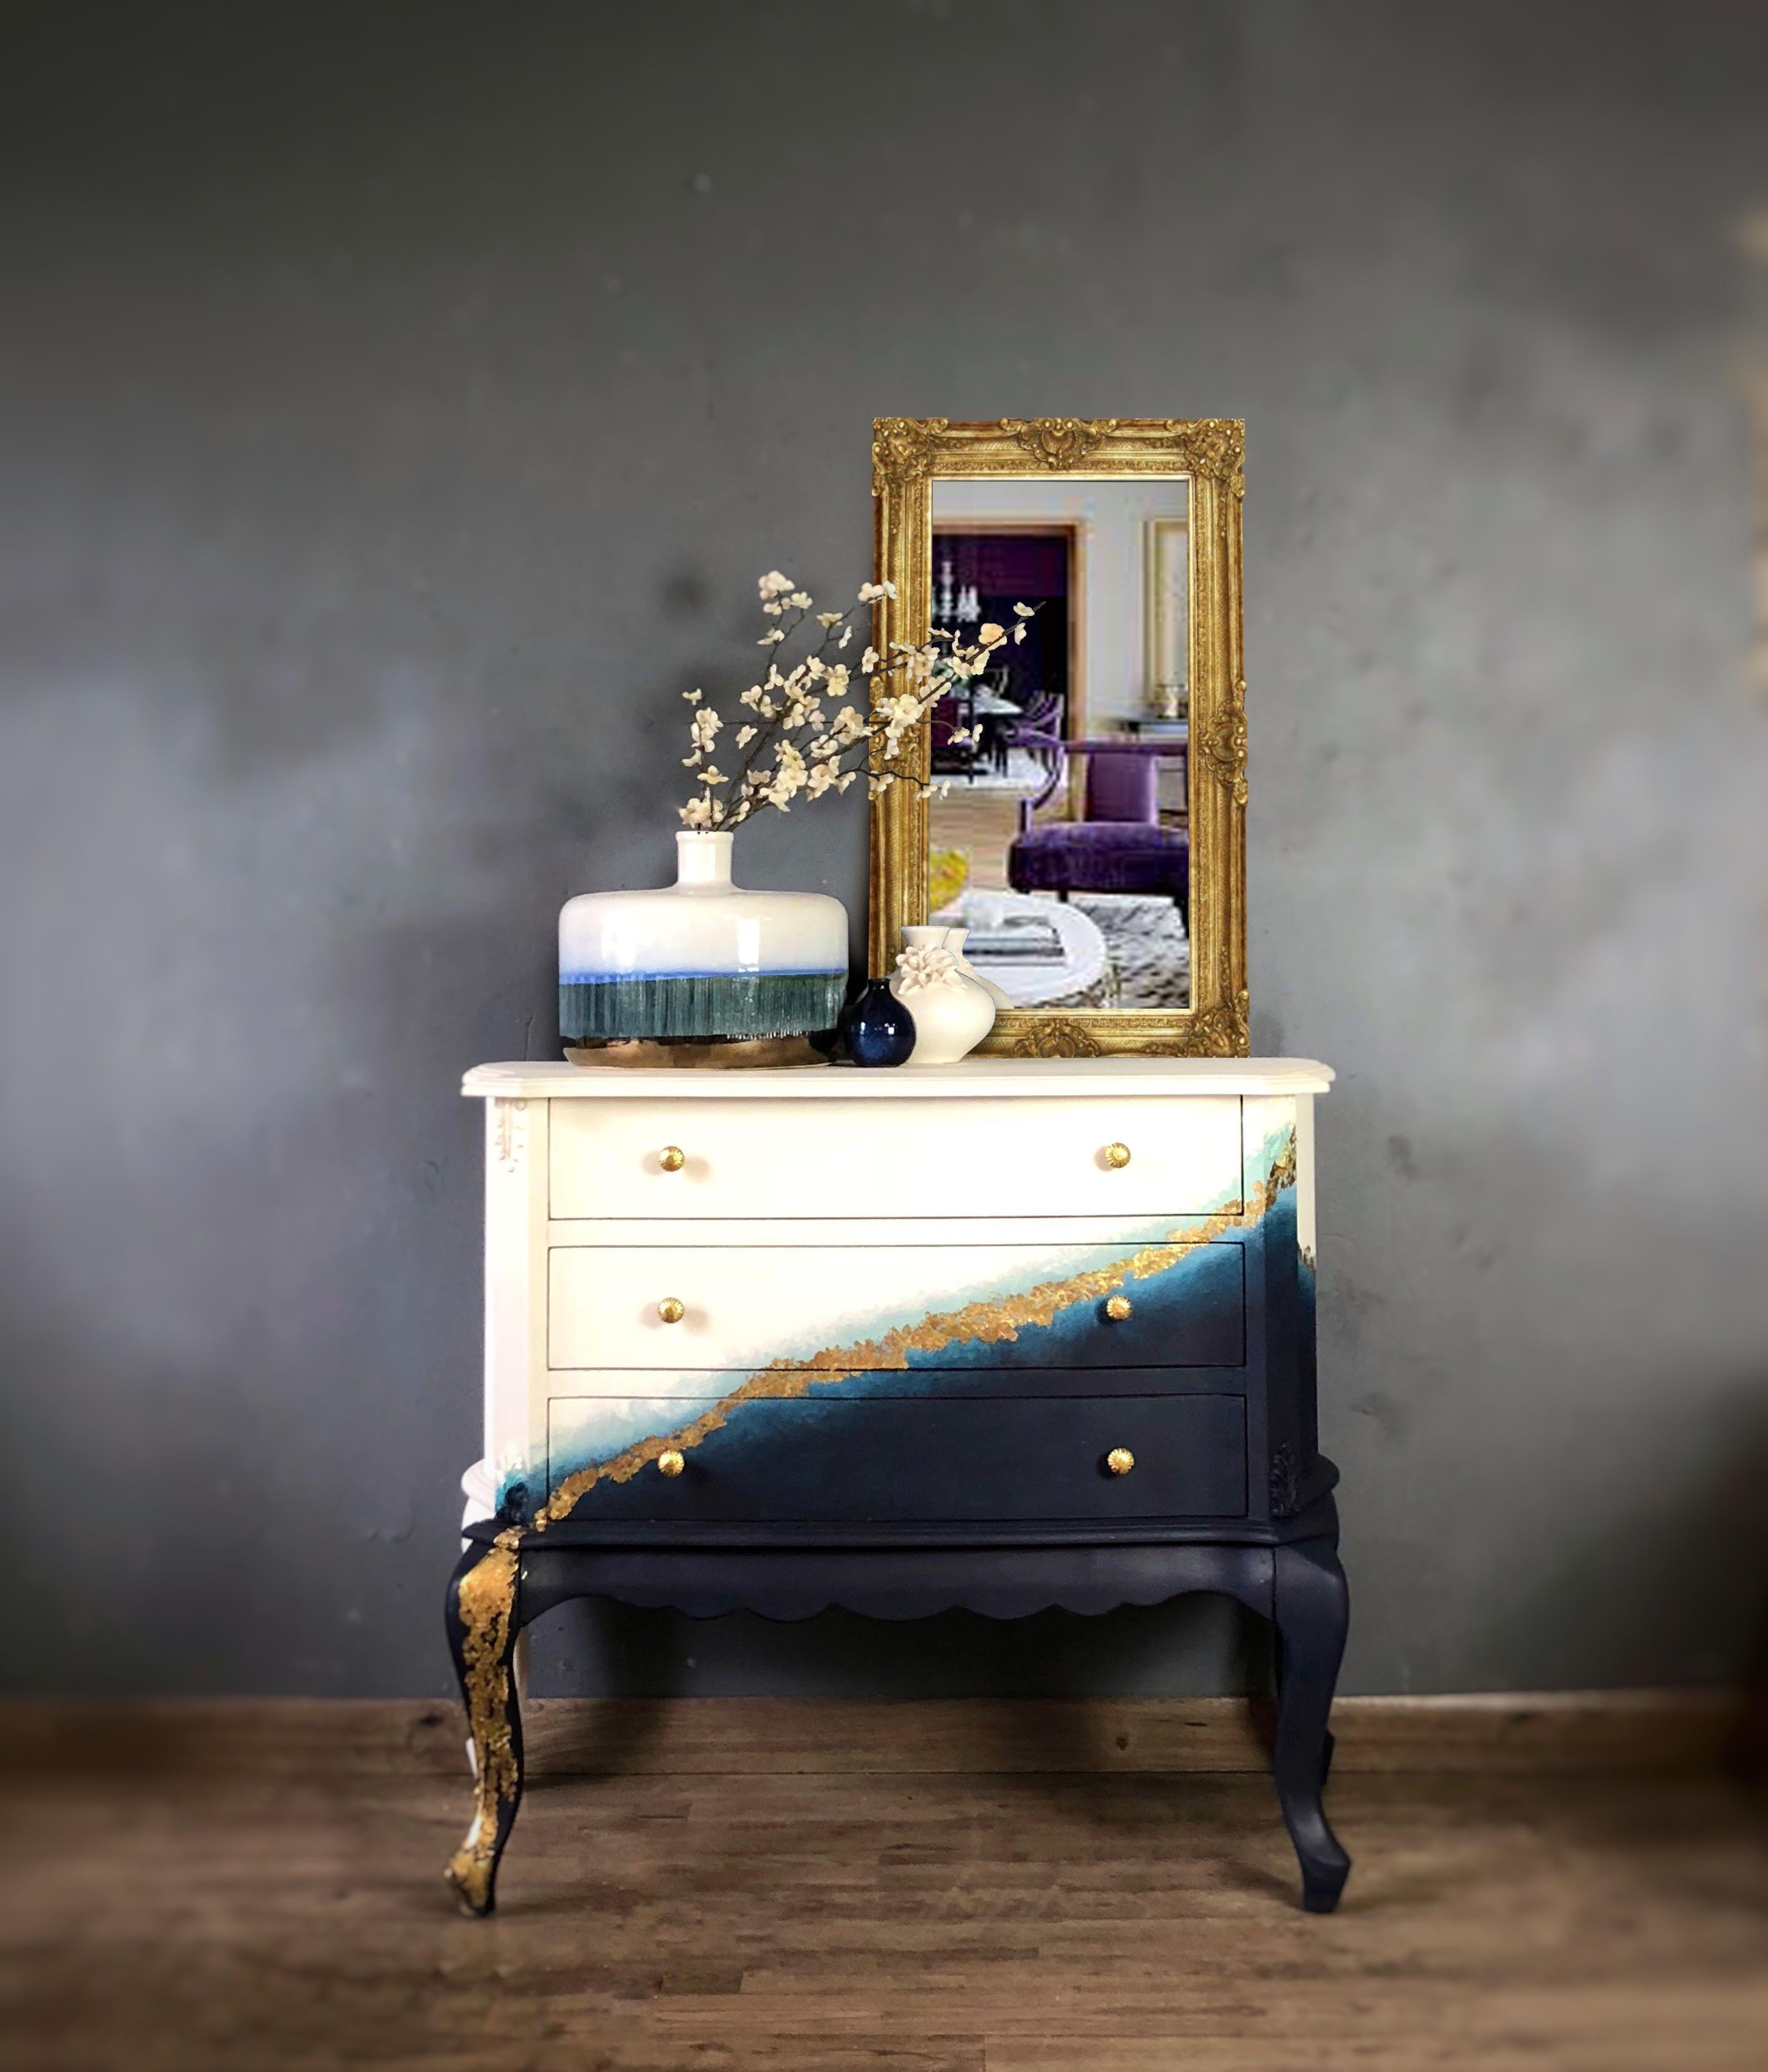 Gold Leaf Geode | General Finishes 2018 Design Challenge Gold Leaf Geode | General Finishes 2018 Design Challenge Brigitte mx31 Möbel You can't help but to look at this[…]  #Challenge #Design #Finishes #general #Geode #Gold #Leaf #ombre painted furniture #navyblueshortdress